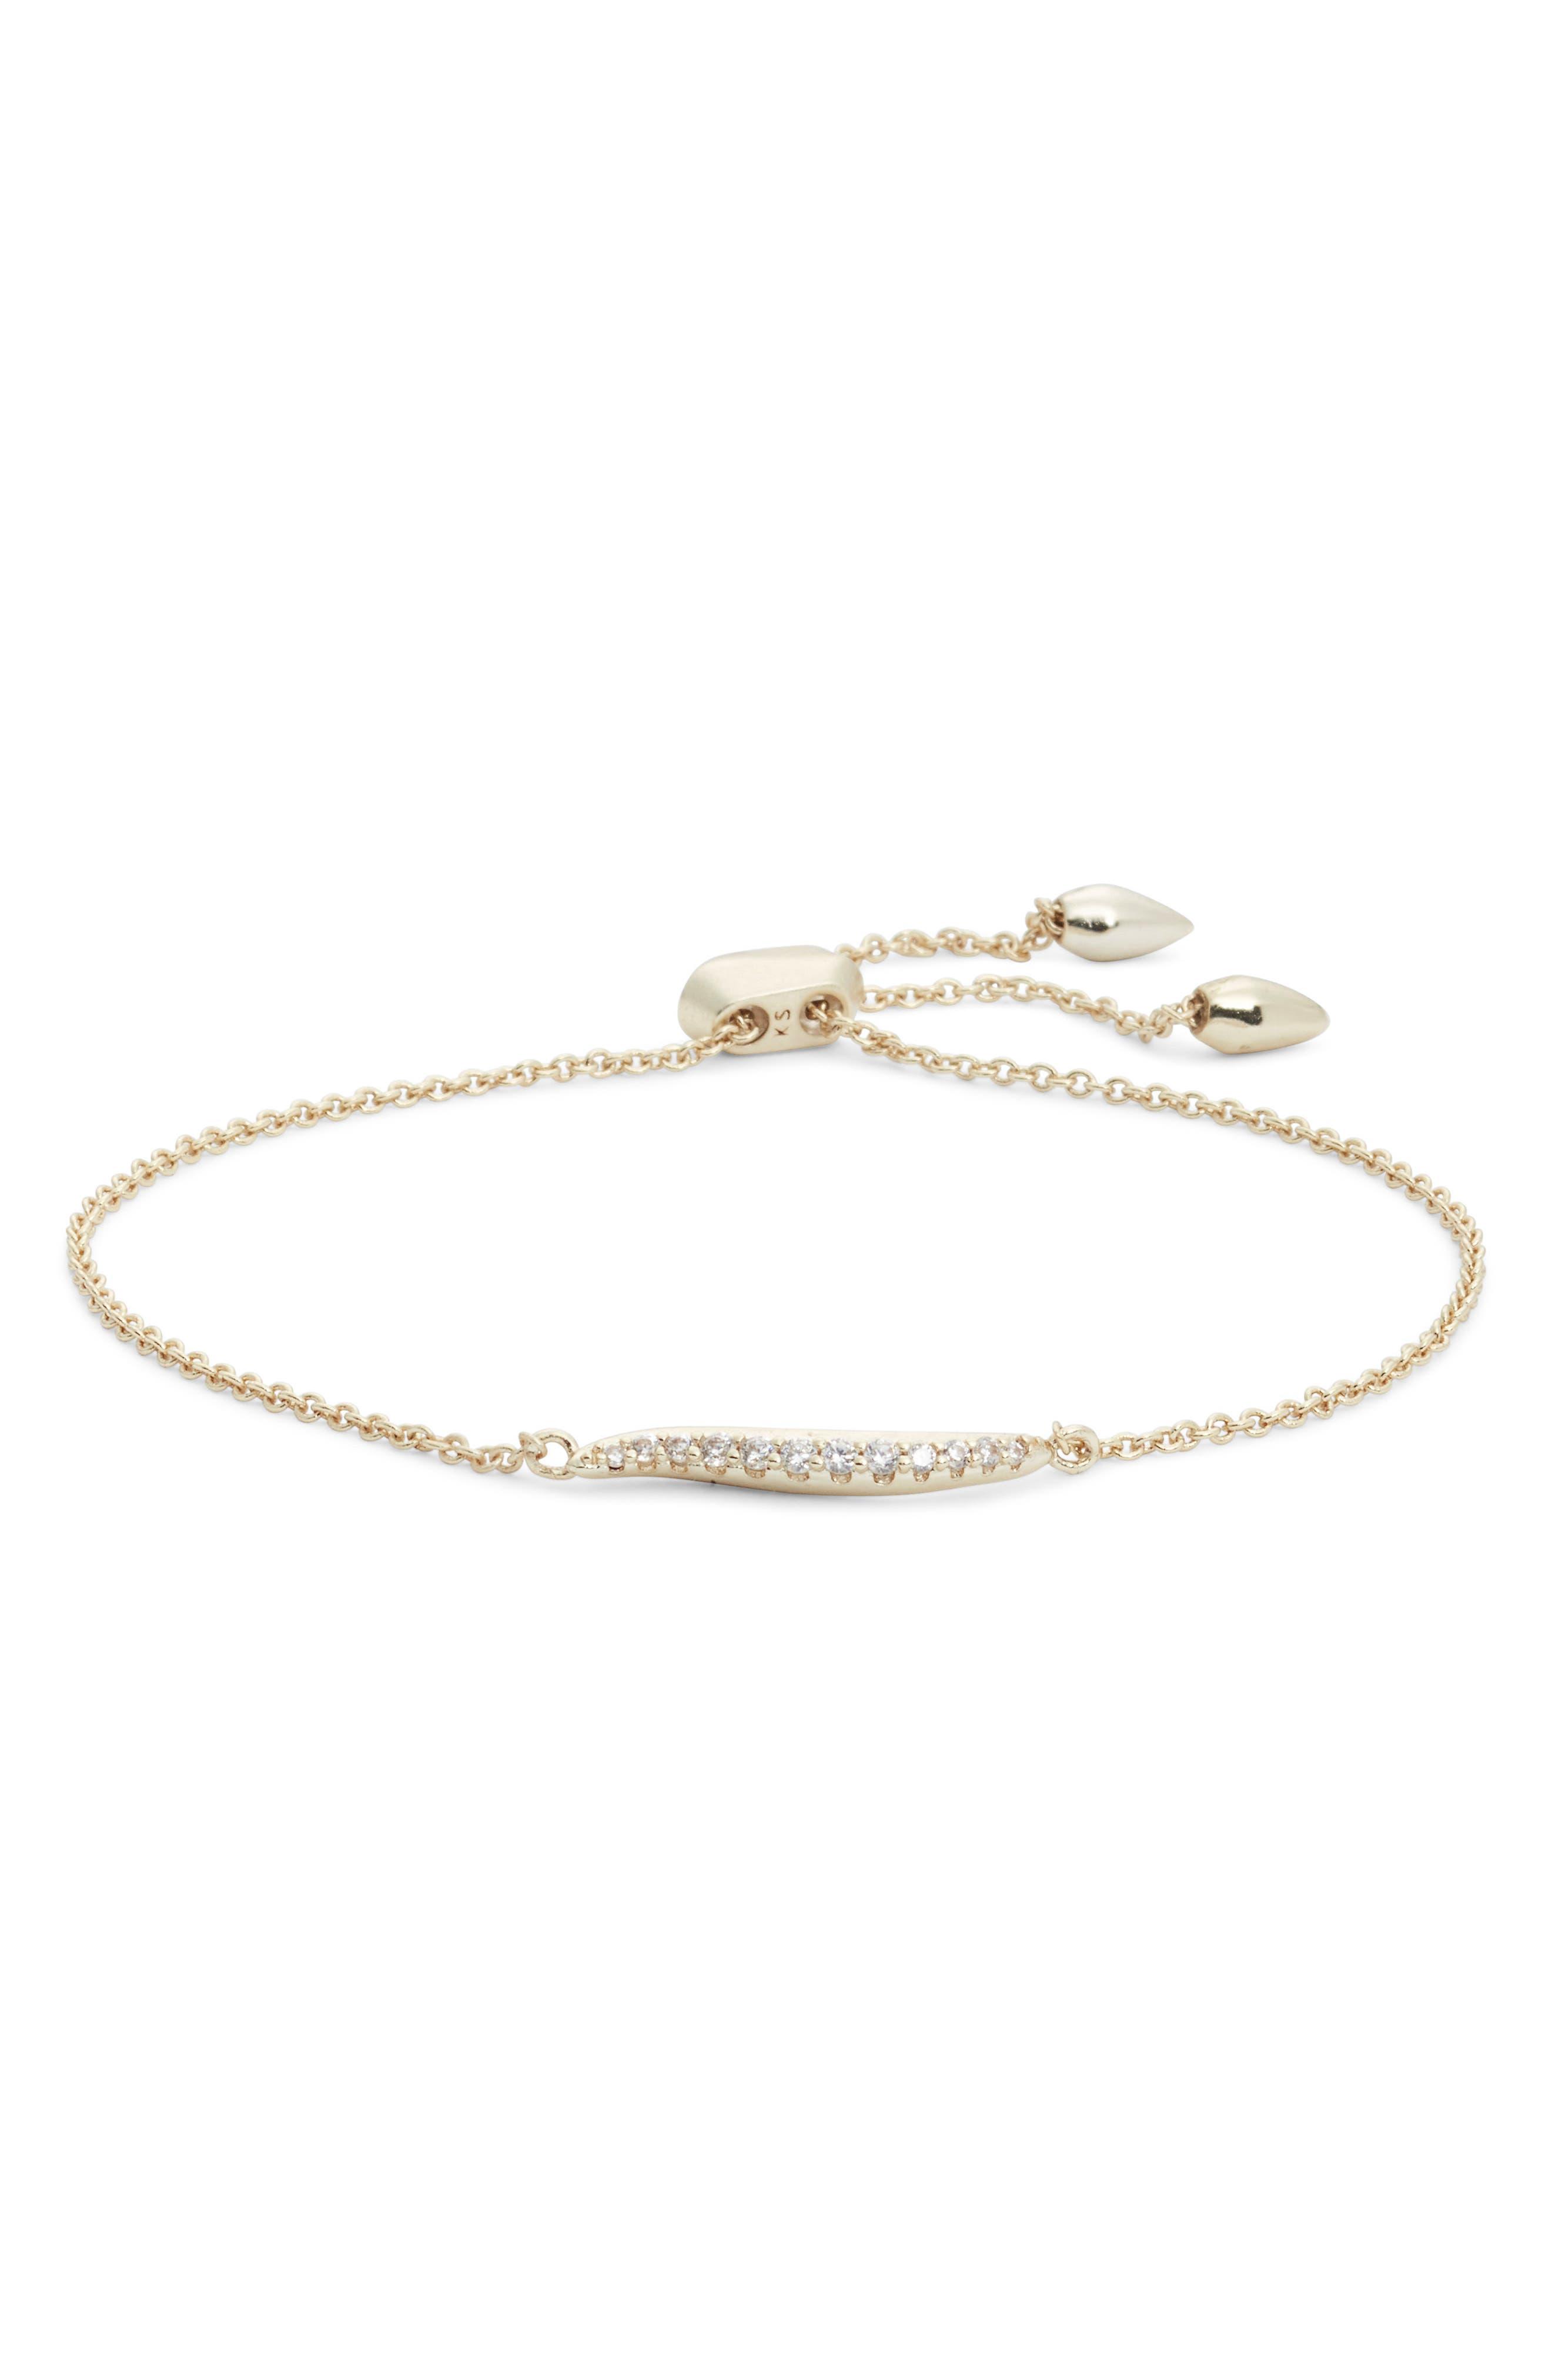 Jemmina Adjustable Bracelet,                             Main thumbnail 1, color,                             WHITE CZ/ GOLD METAL